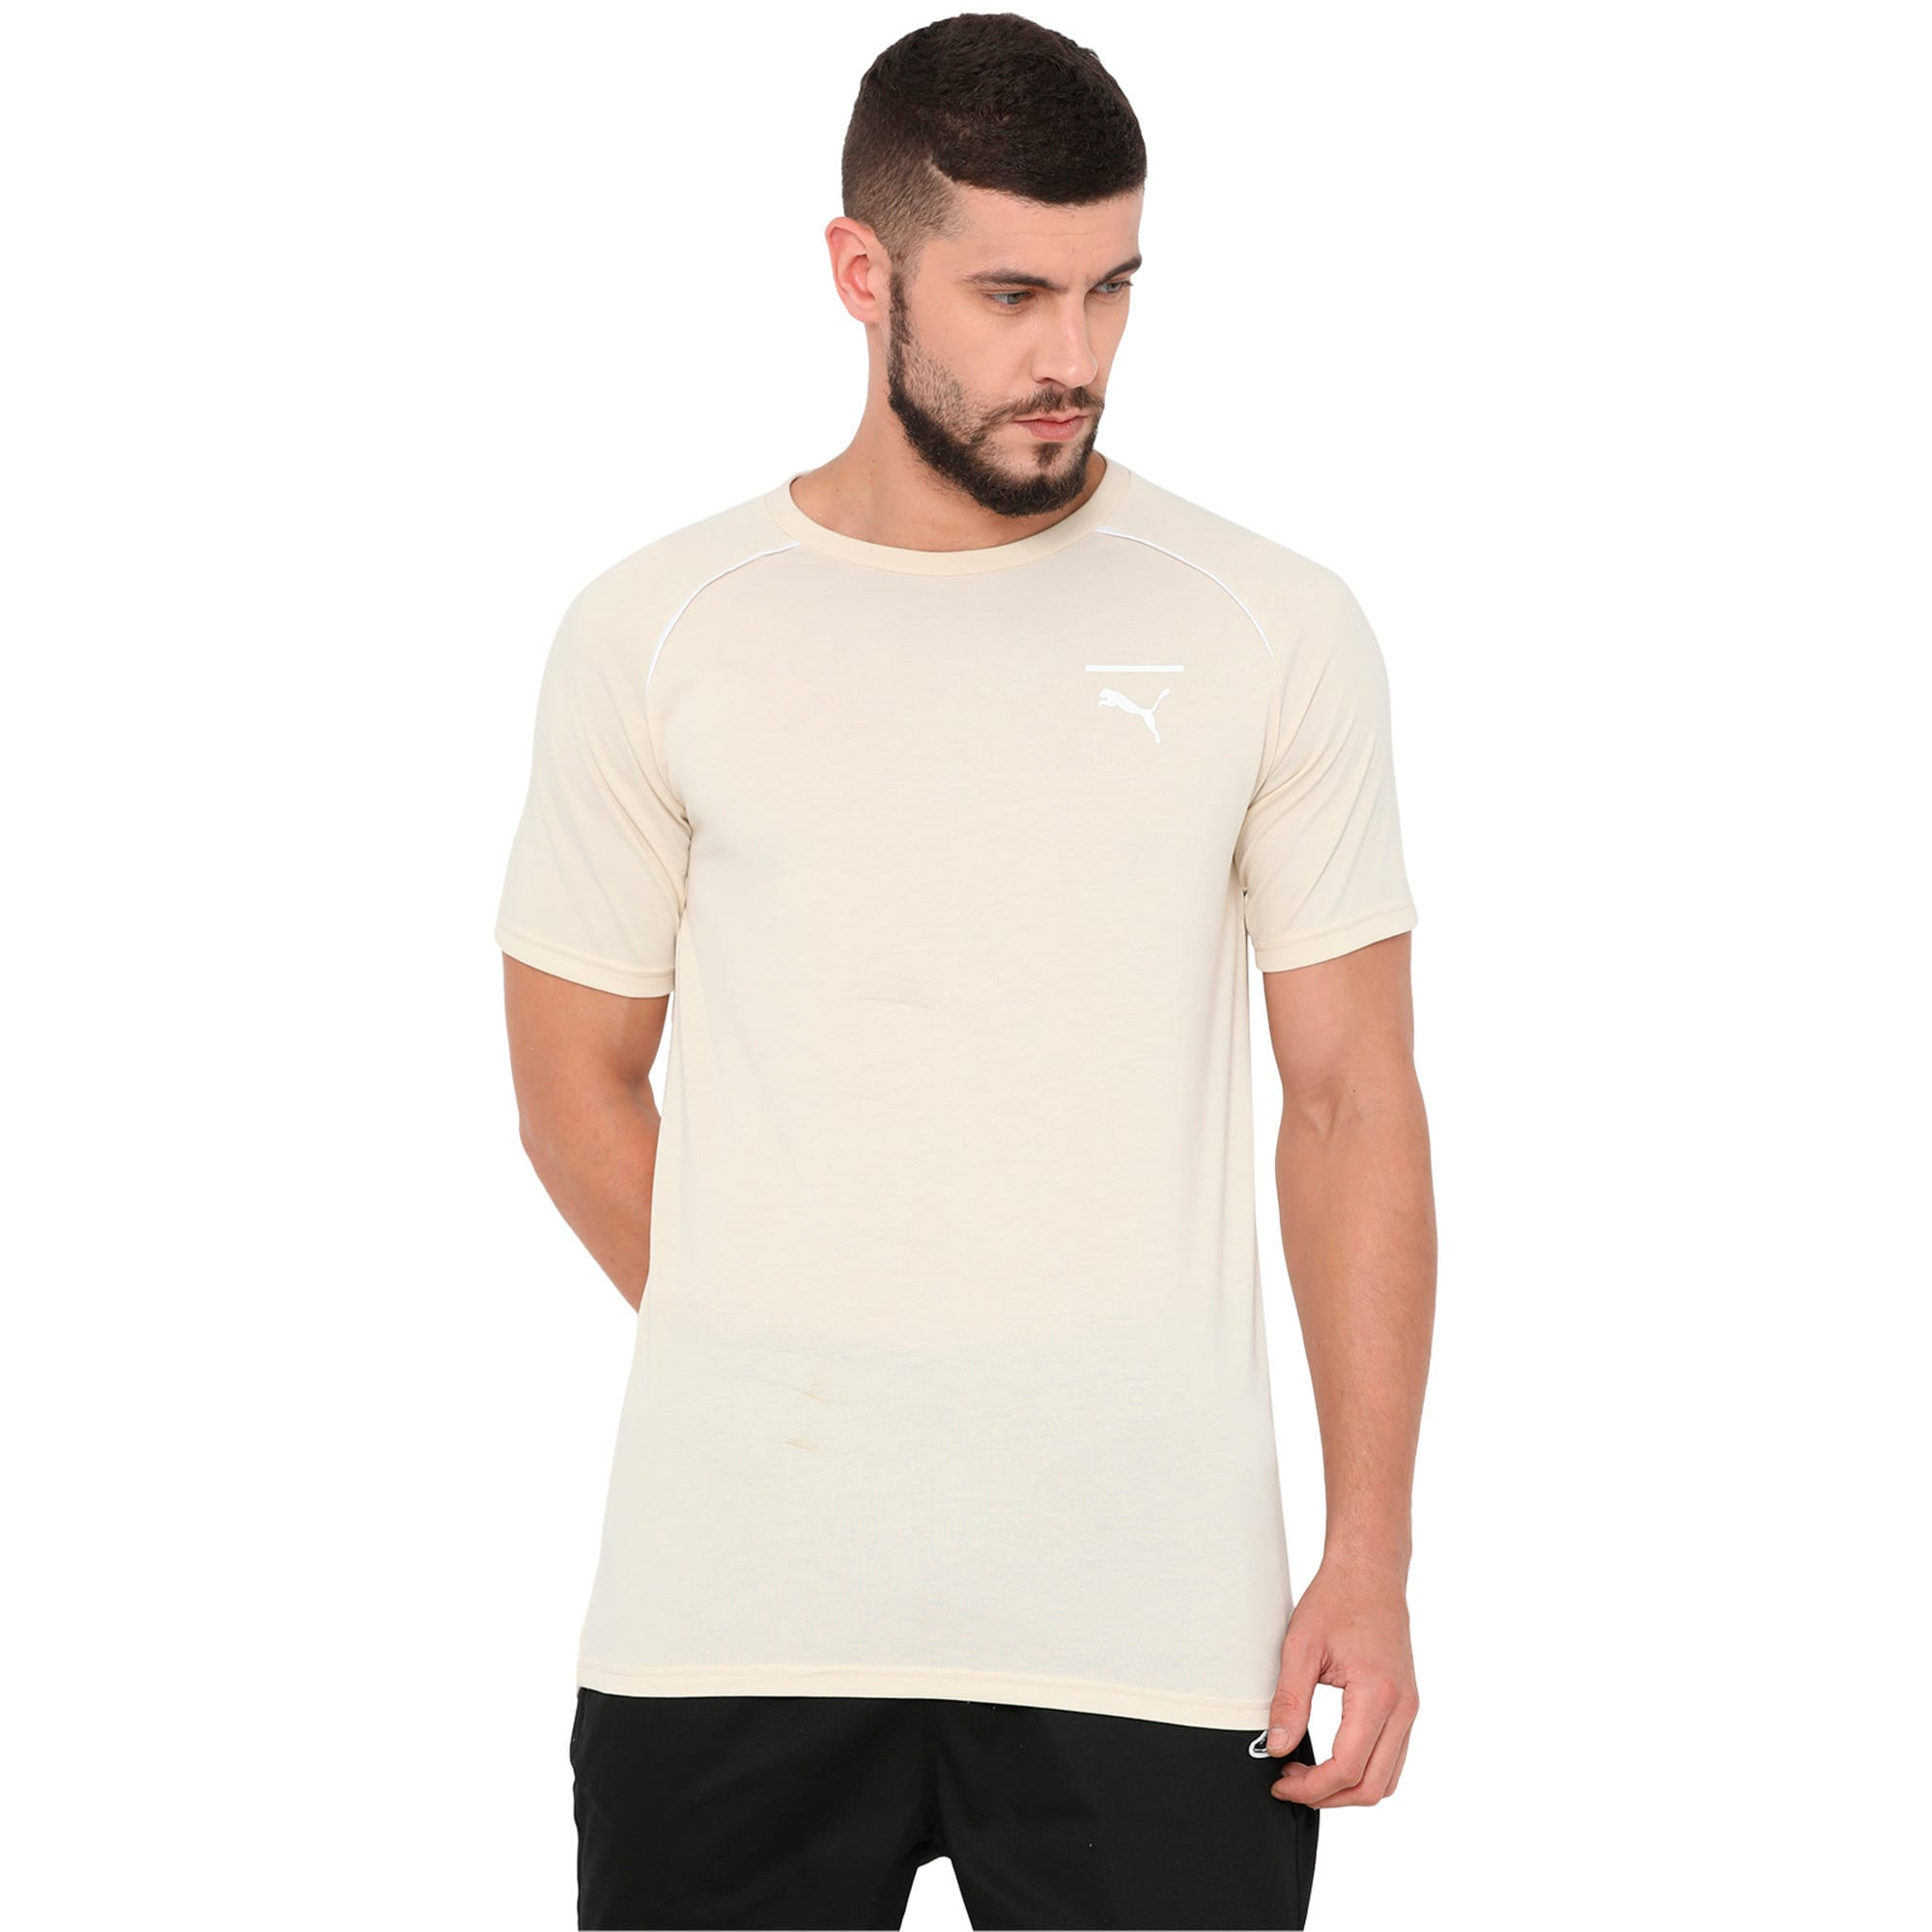 Thumbnail 3 of Evolution Men's Core T-Shirt, Birch, medium-IND